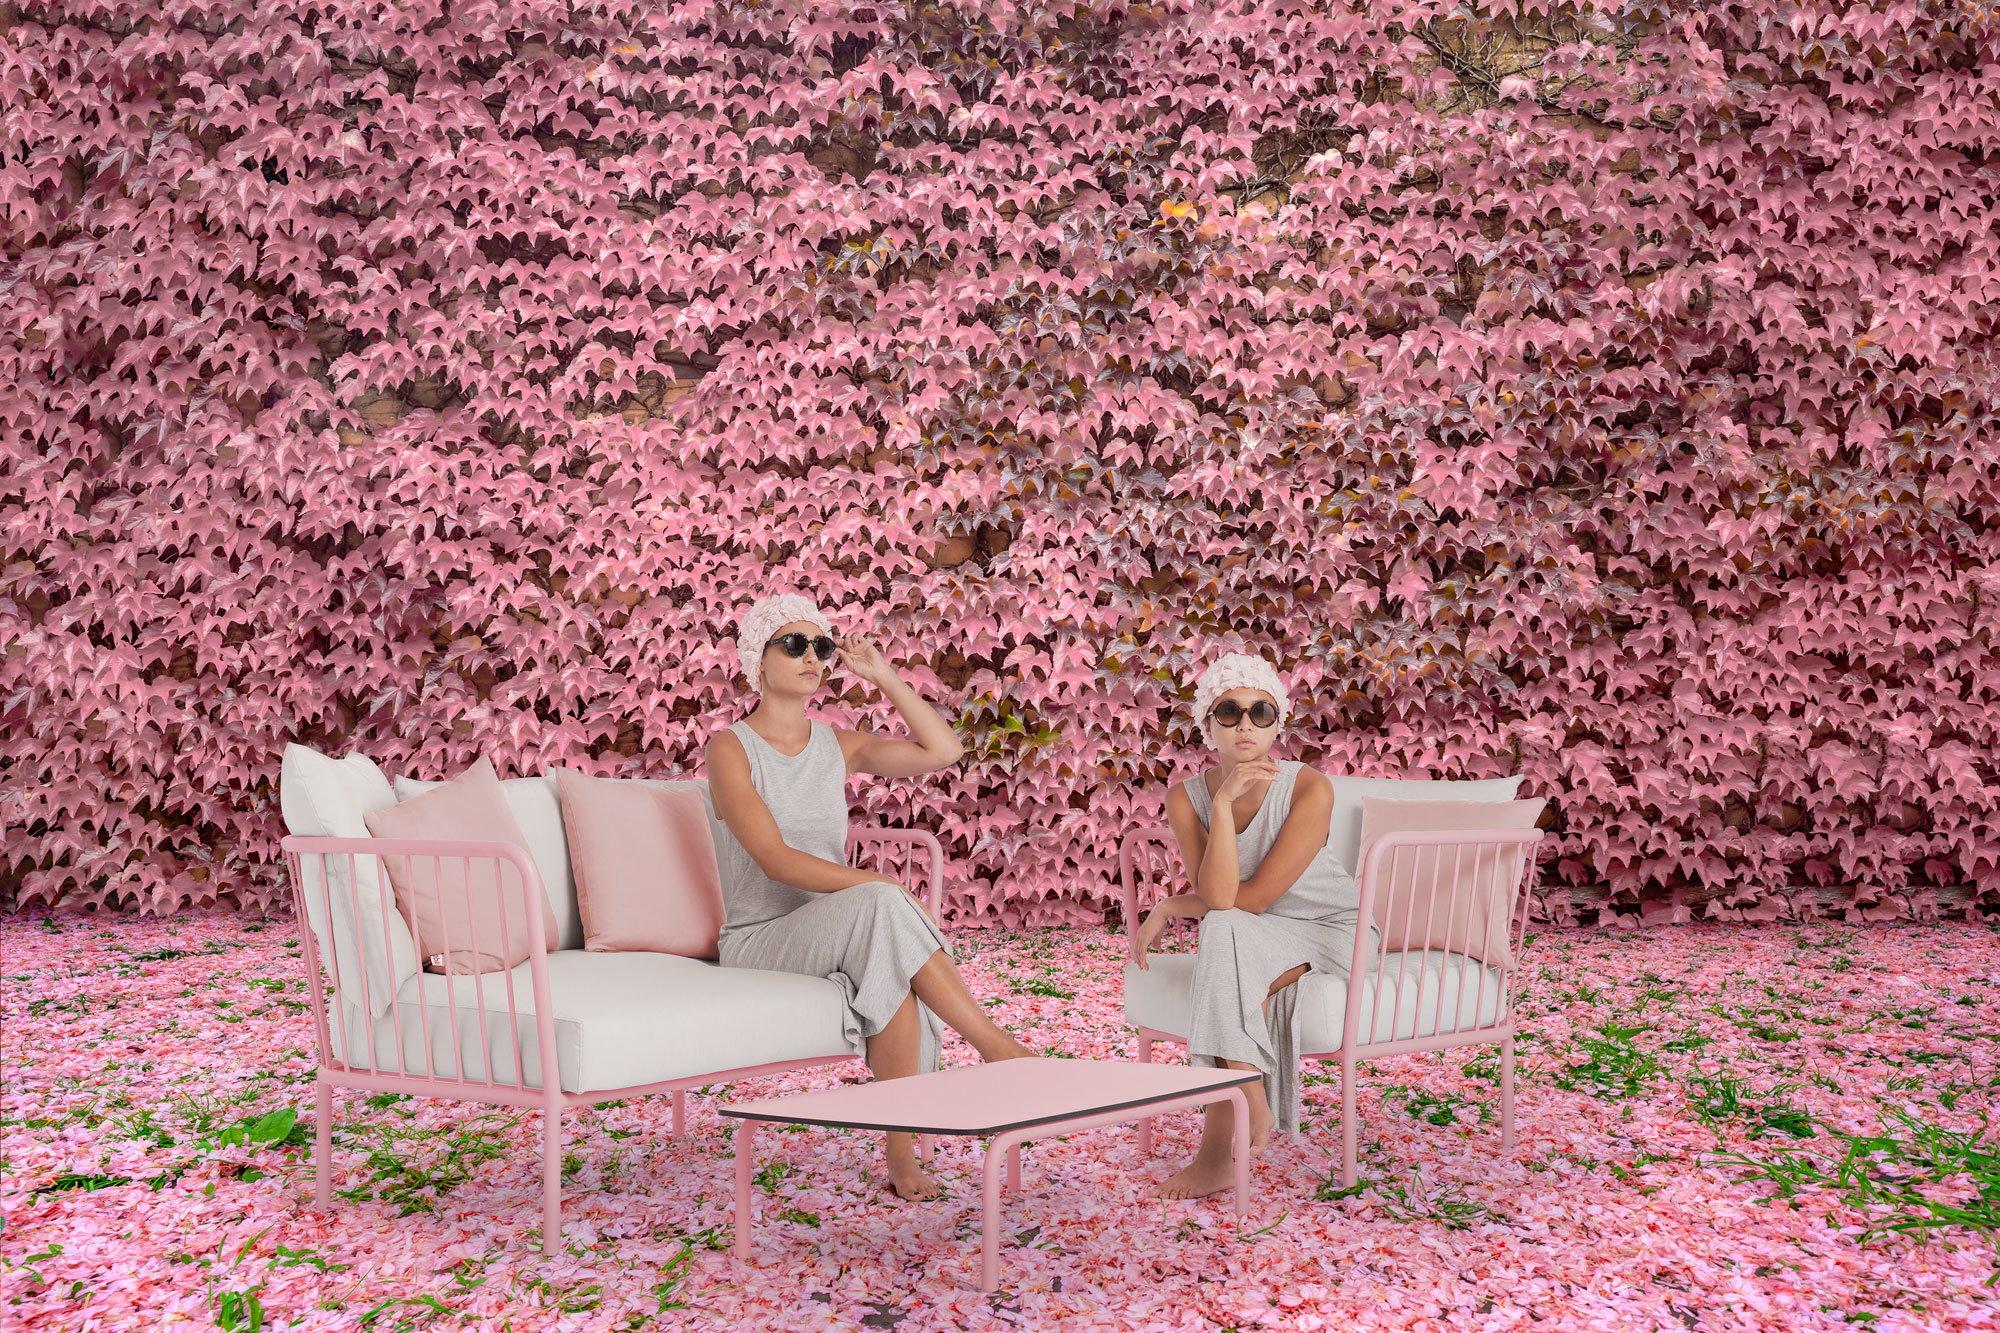 Outdoor-Möbel & Outdoor-KüchenMade Studio, Lounge-Sessel und -Sofa Arp, Diabla. Foto/ Copyright: Diabla